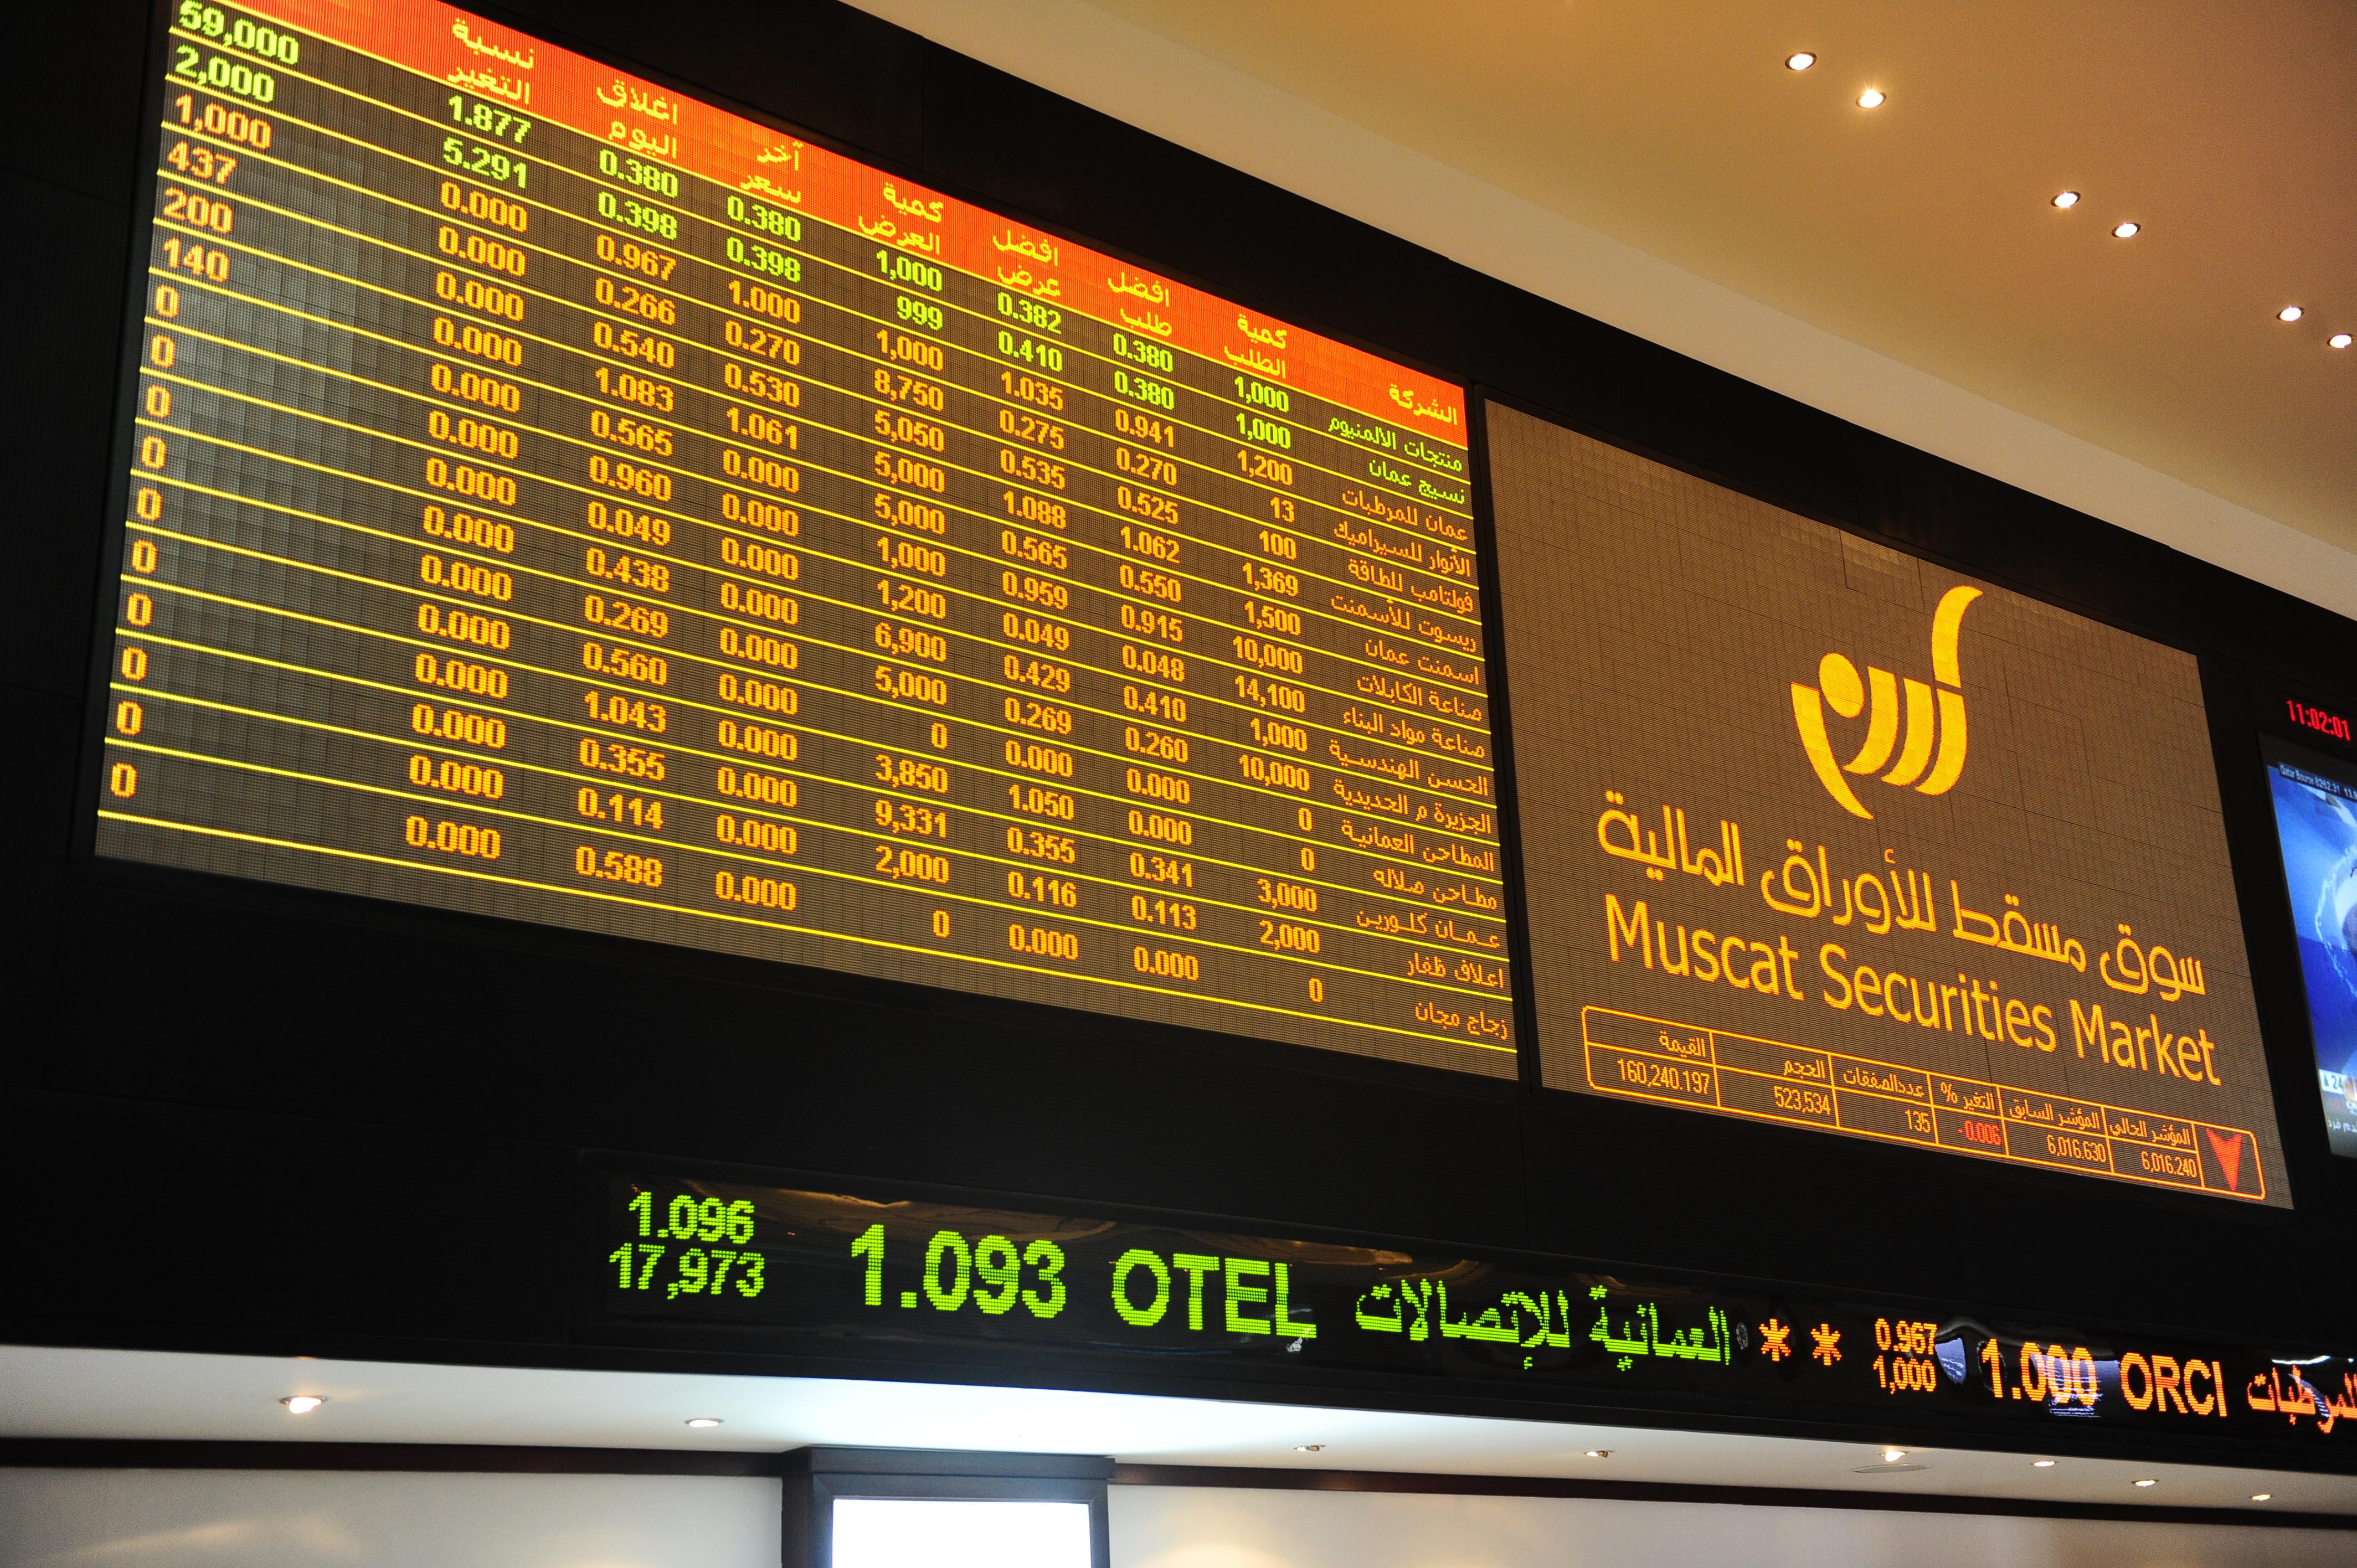 Telecom stocks lead Oman share index lower